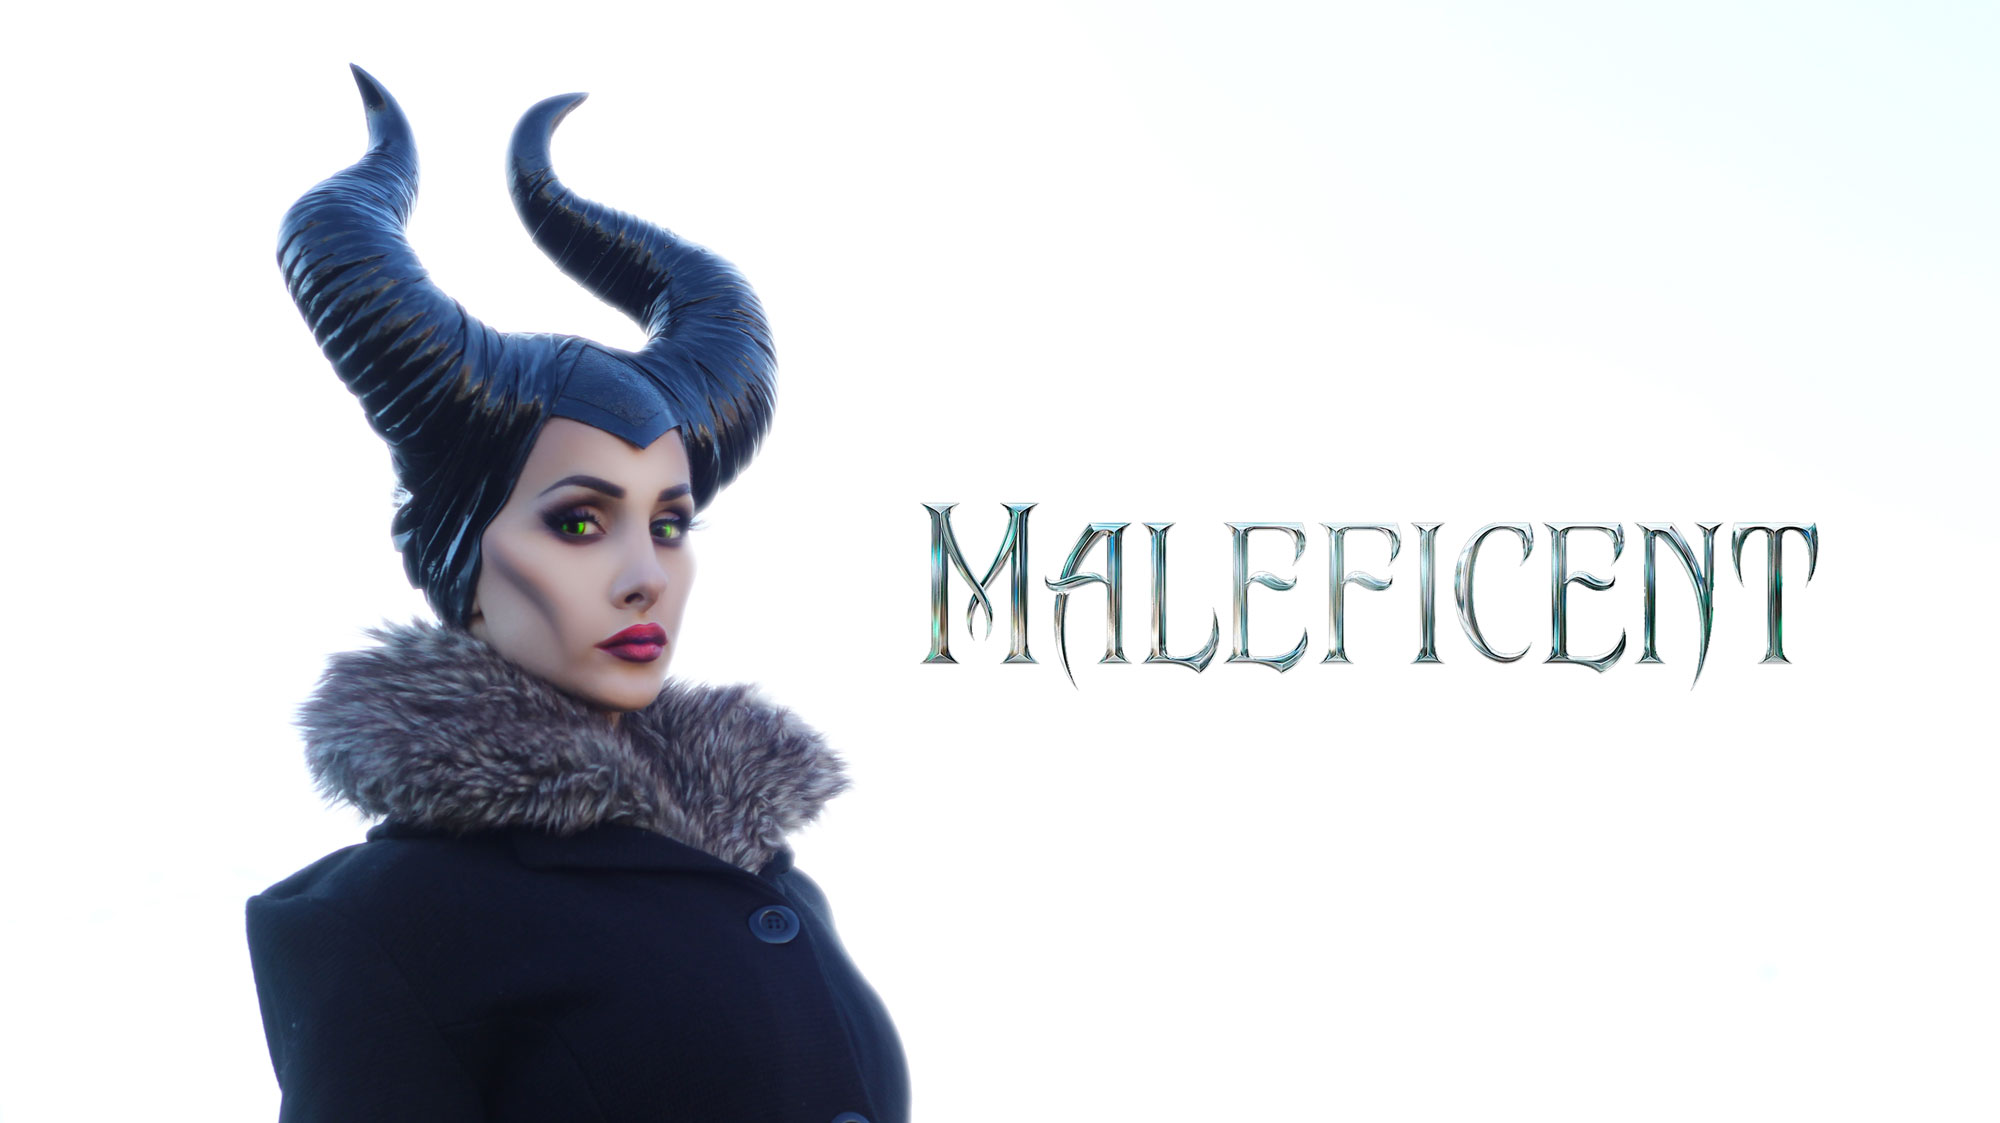 Maleficent 28395 2000x1123 px HDWallSourcecom